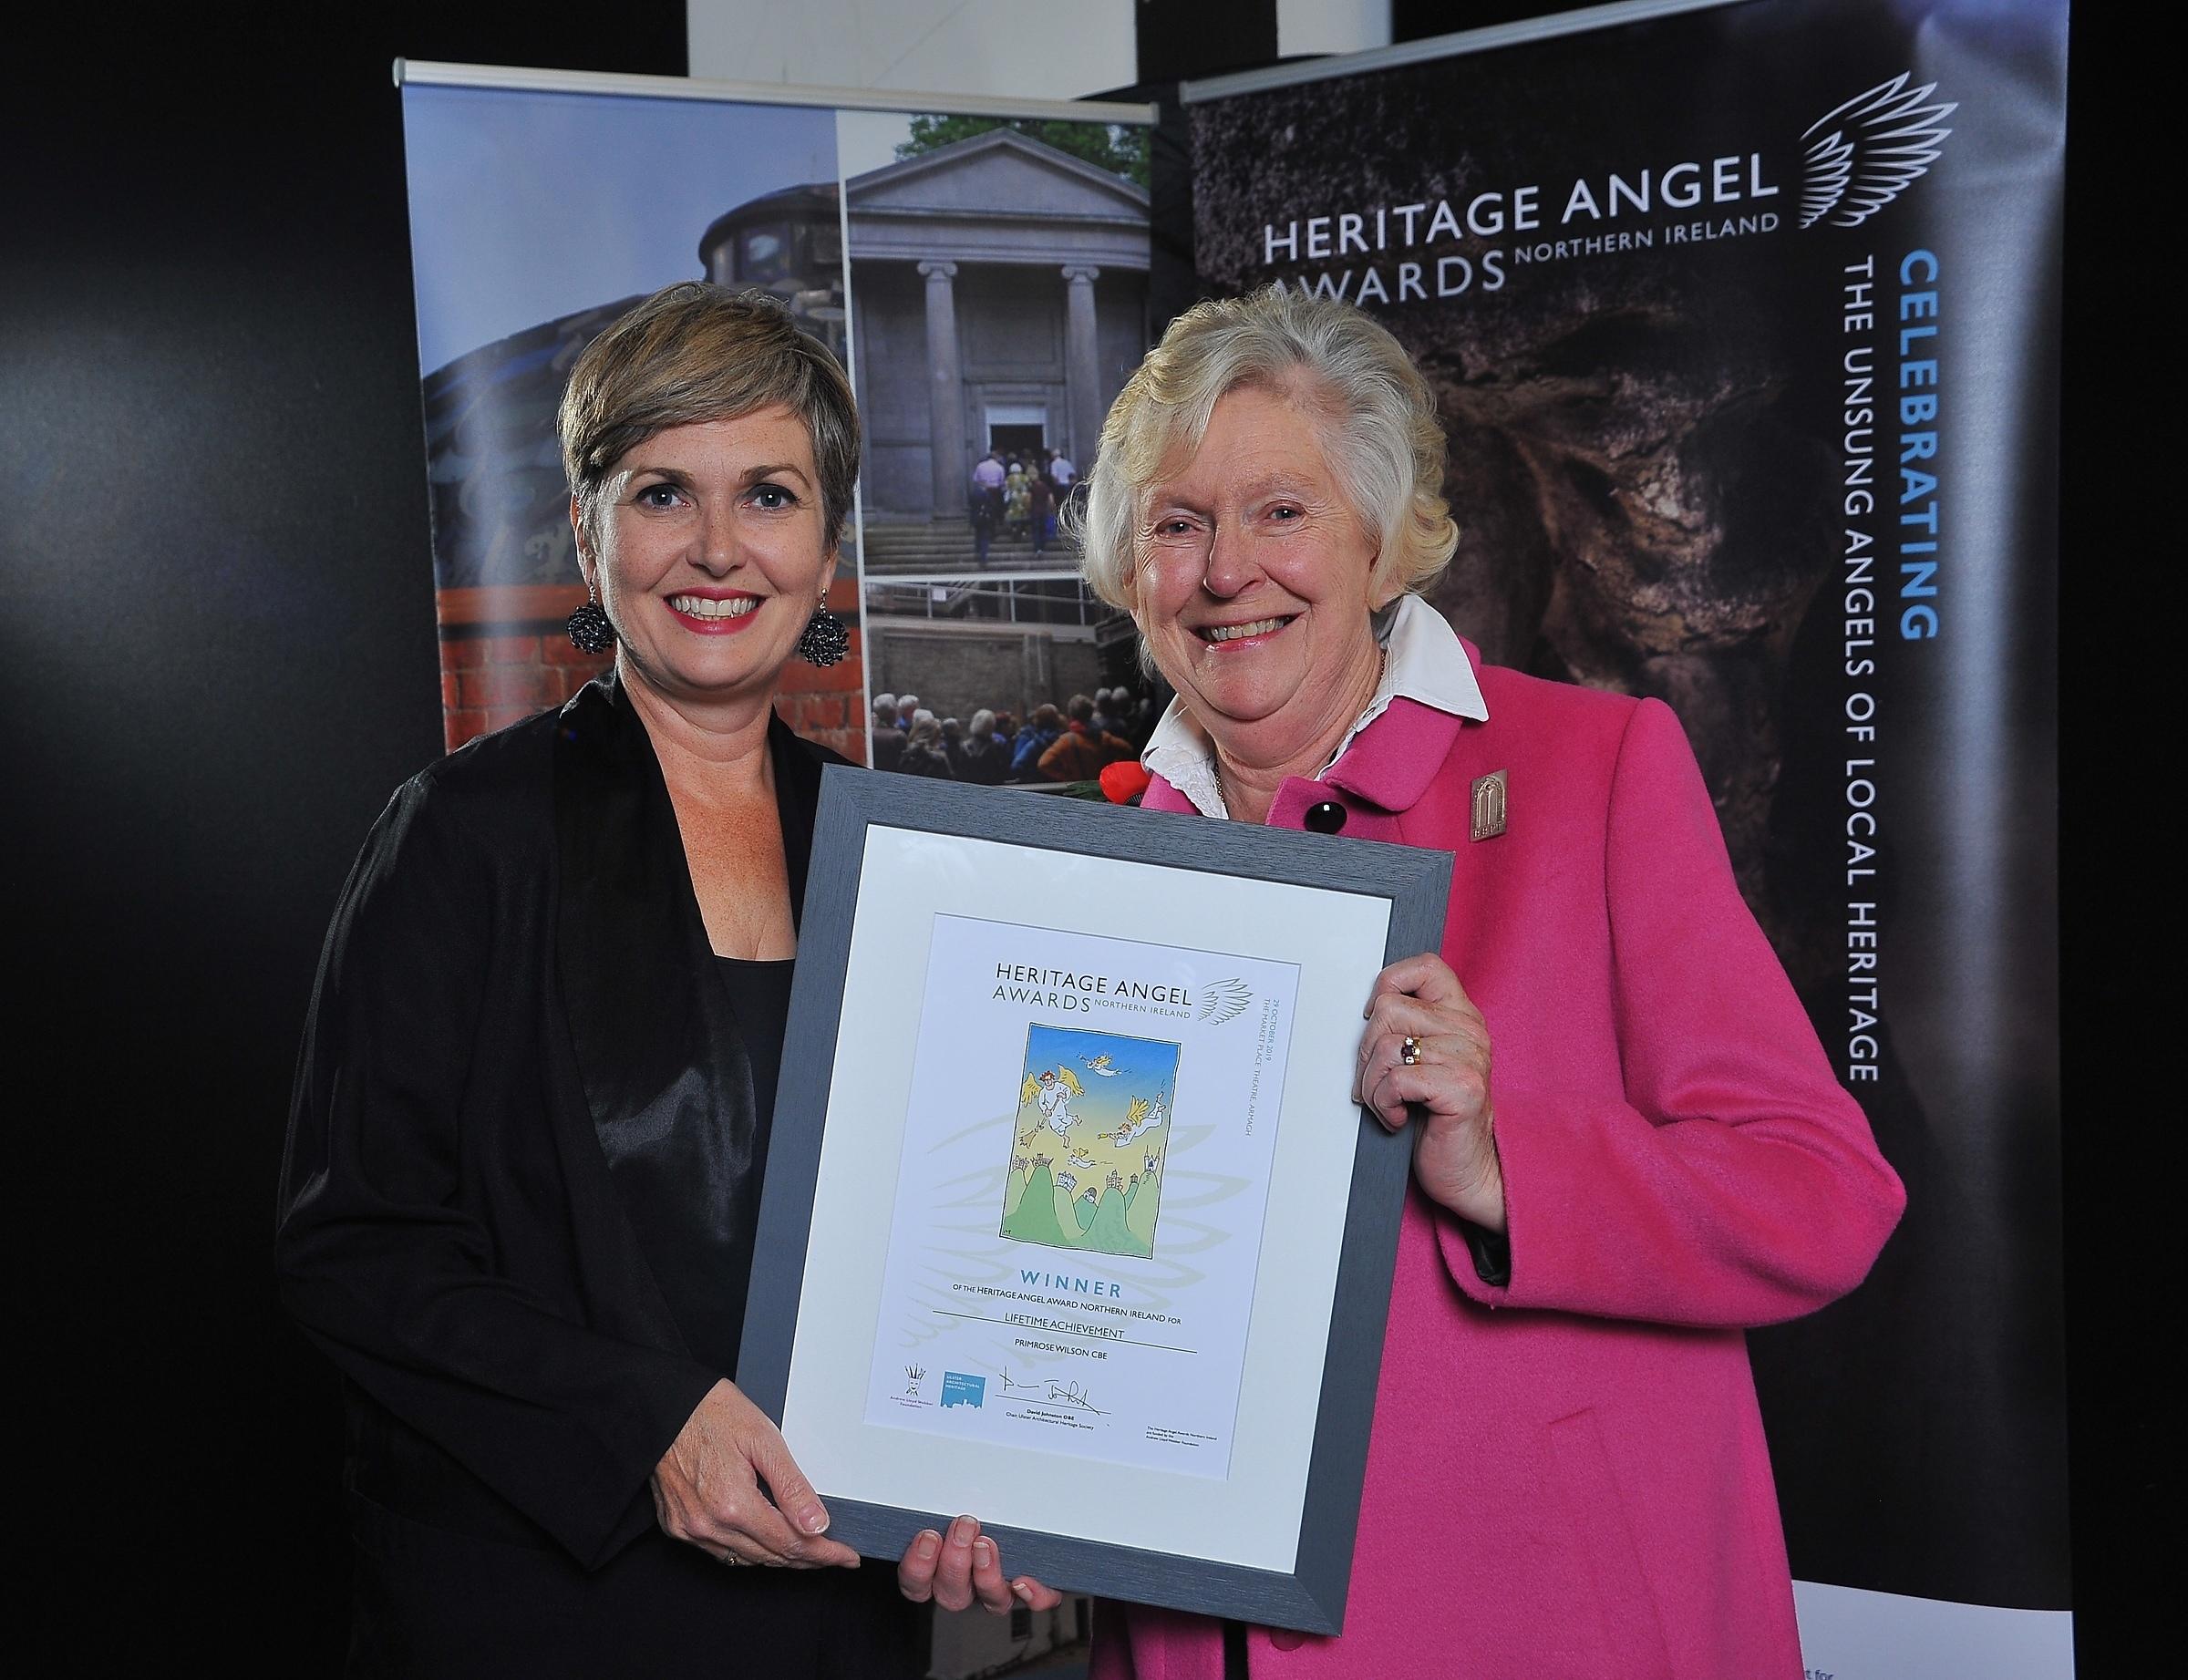 Heritage-Angels-Lifetime-Awards-Primrose-Wilson-with-BBC-Presenter-Marie-Louise-Muir.jpg#asset:12949